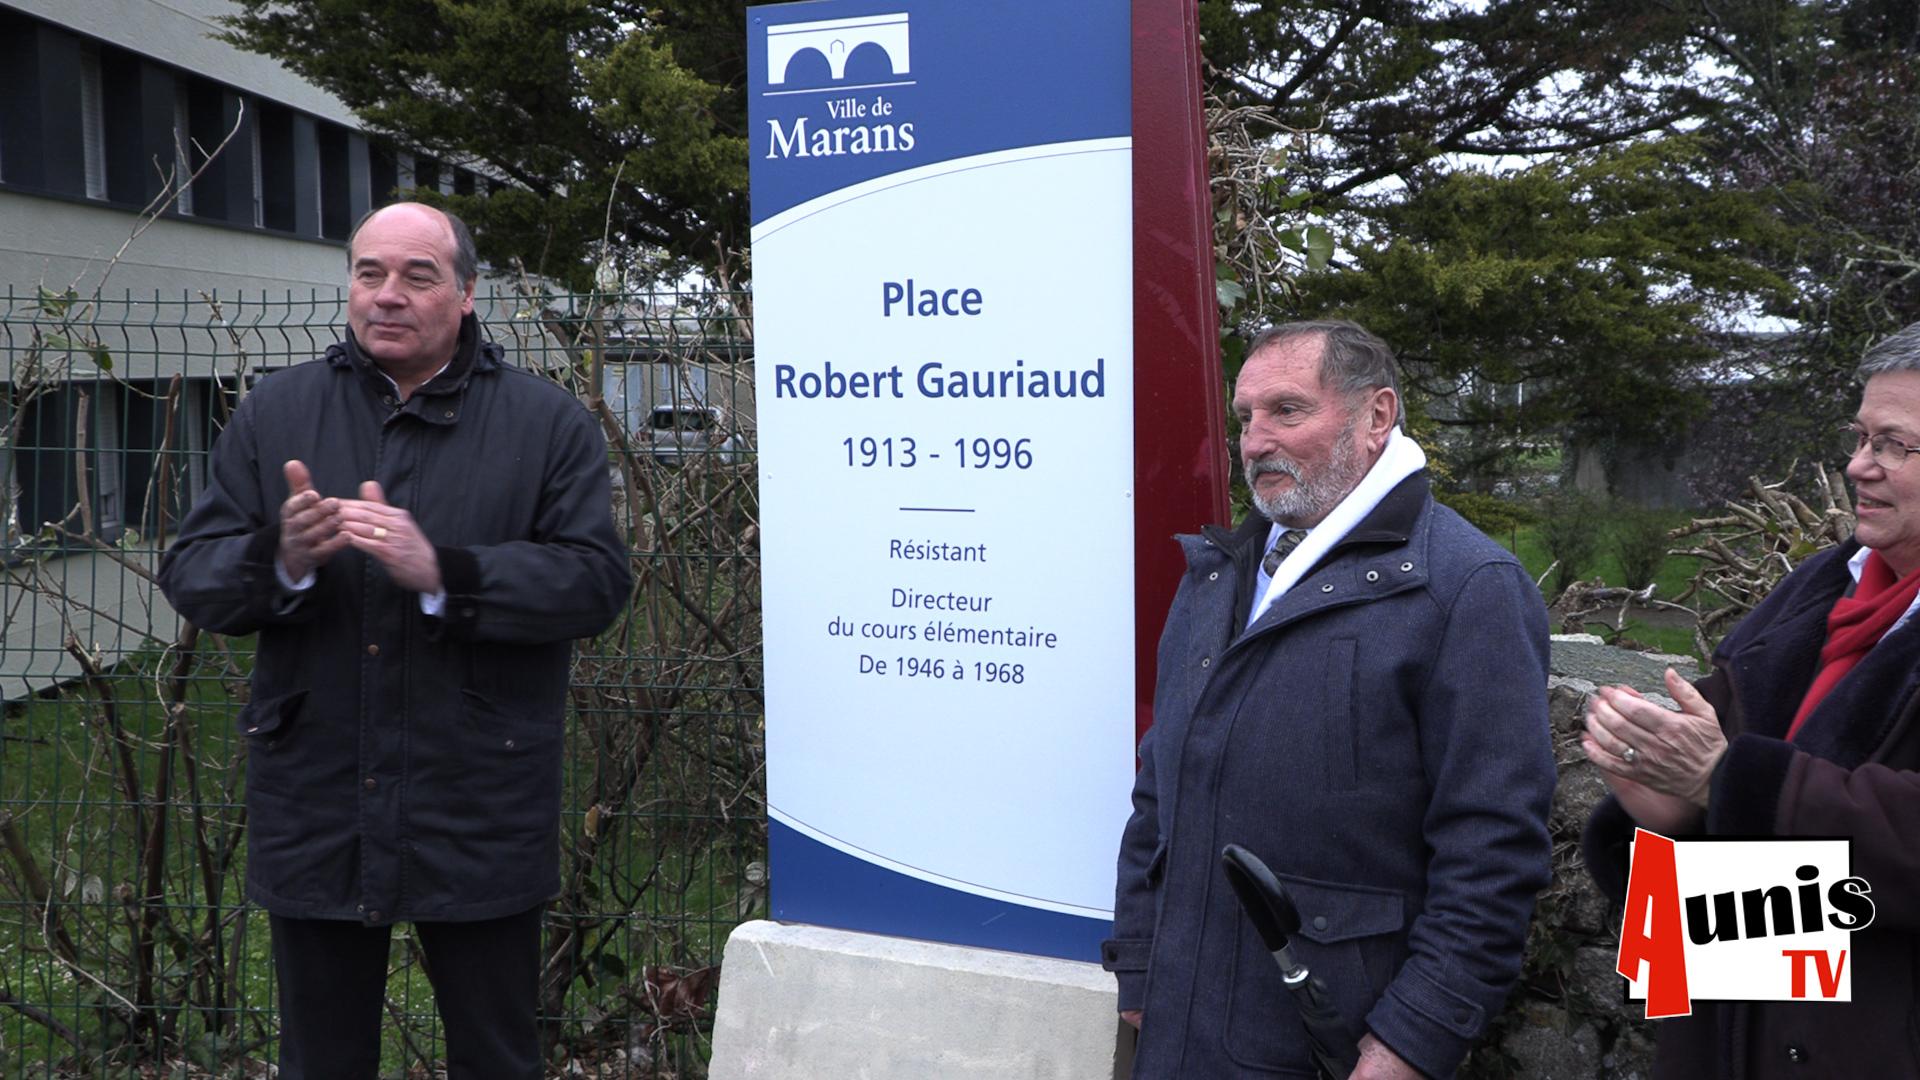 Robert Gauriaud